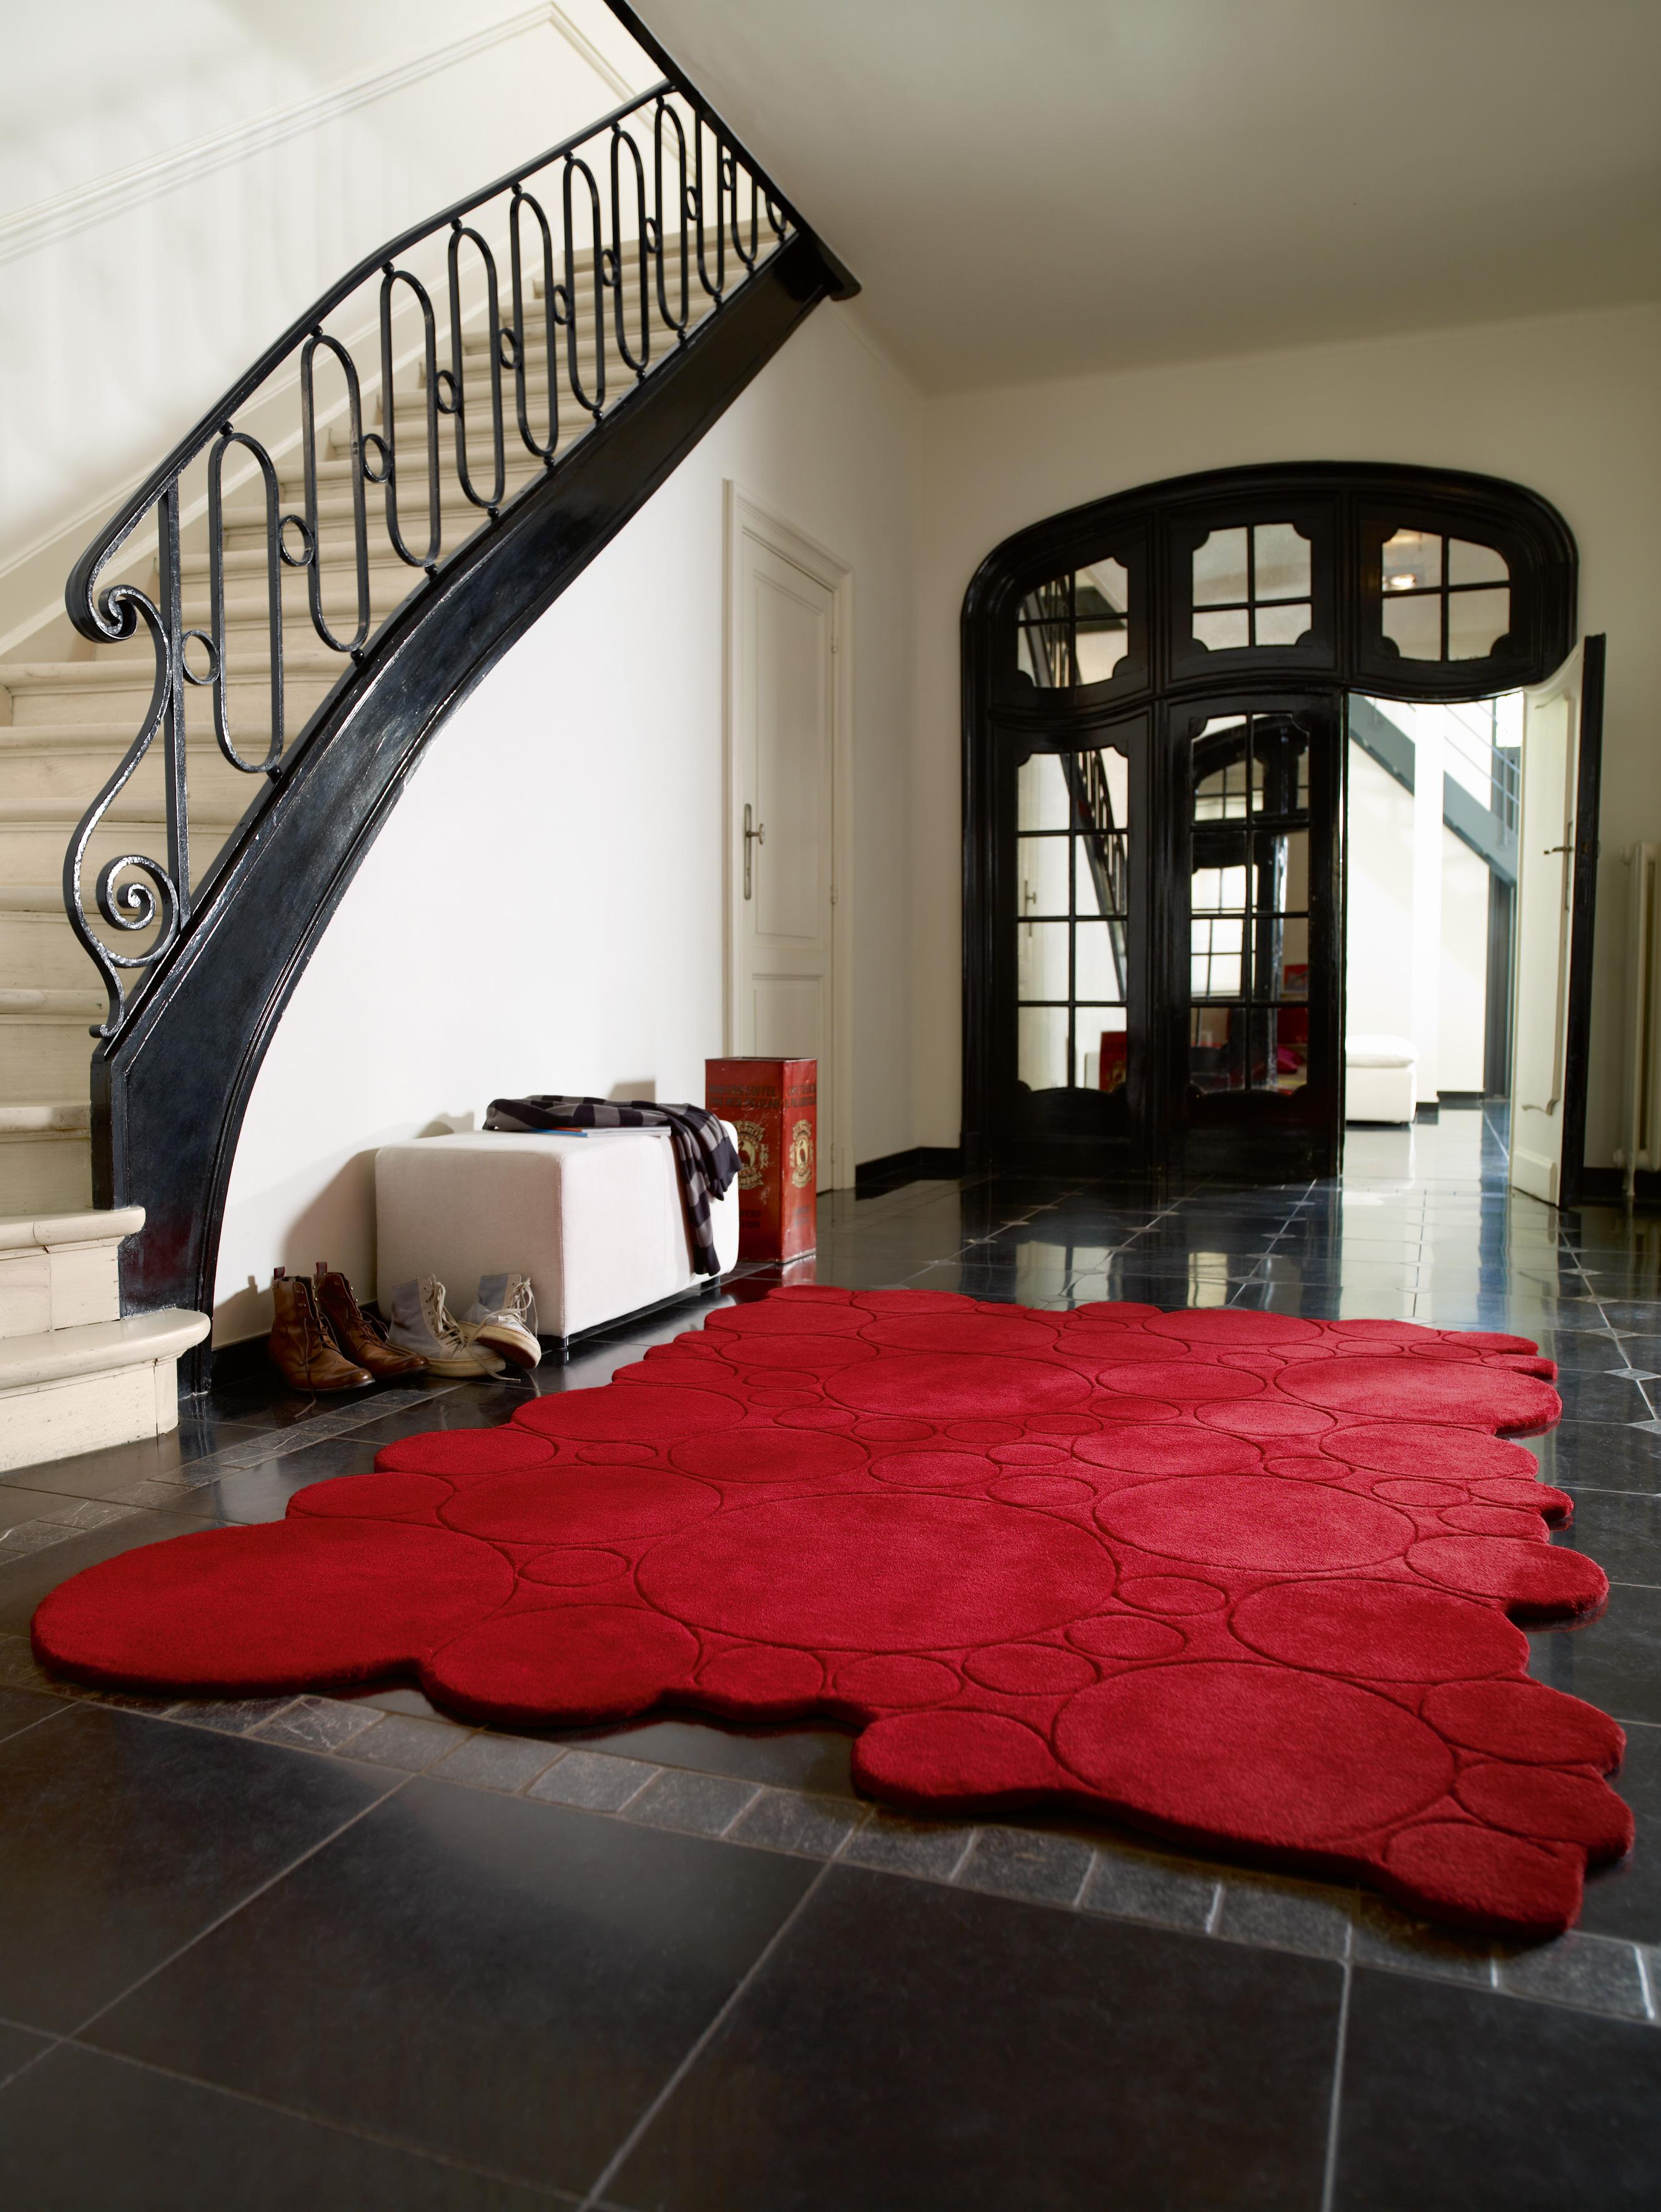 dossier couleurs partie 1 blog. Black Bedroom Furniture Sets. Home Design Ideas